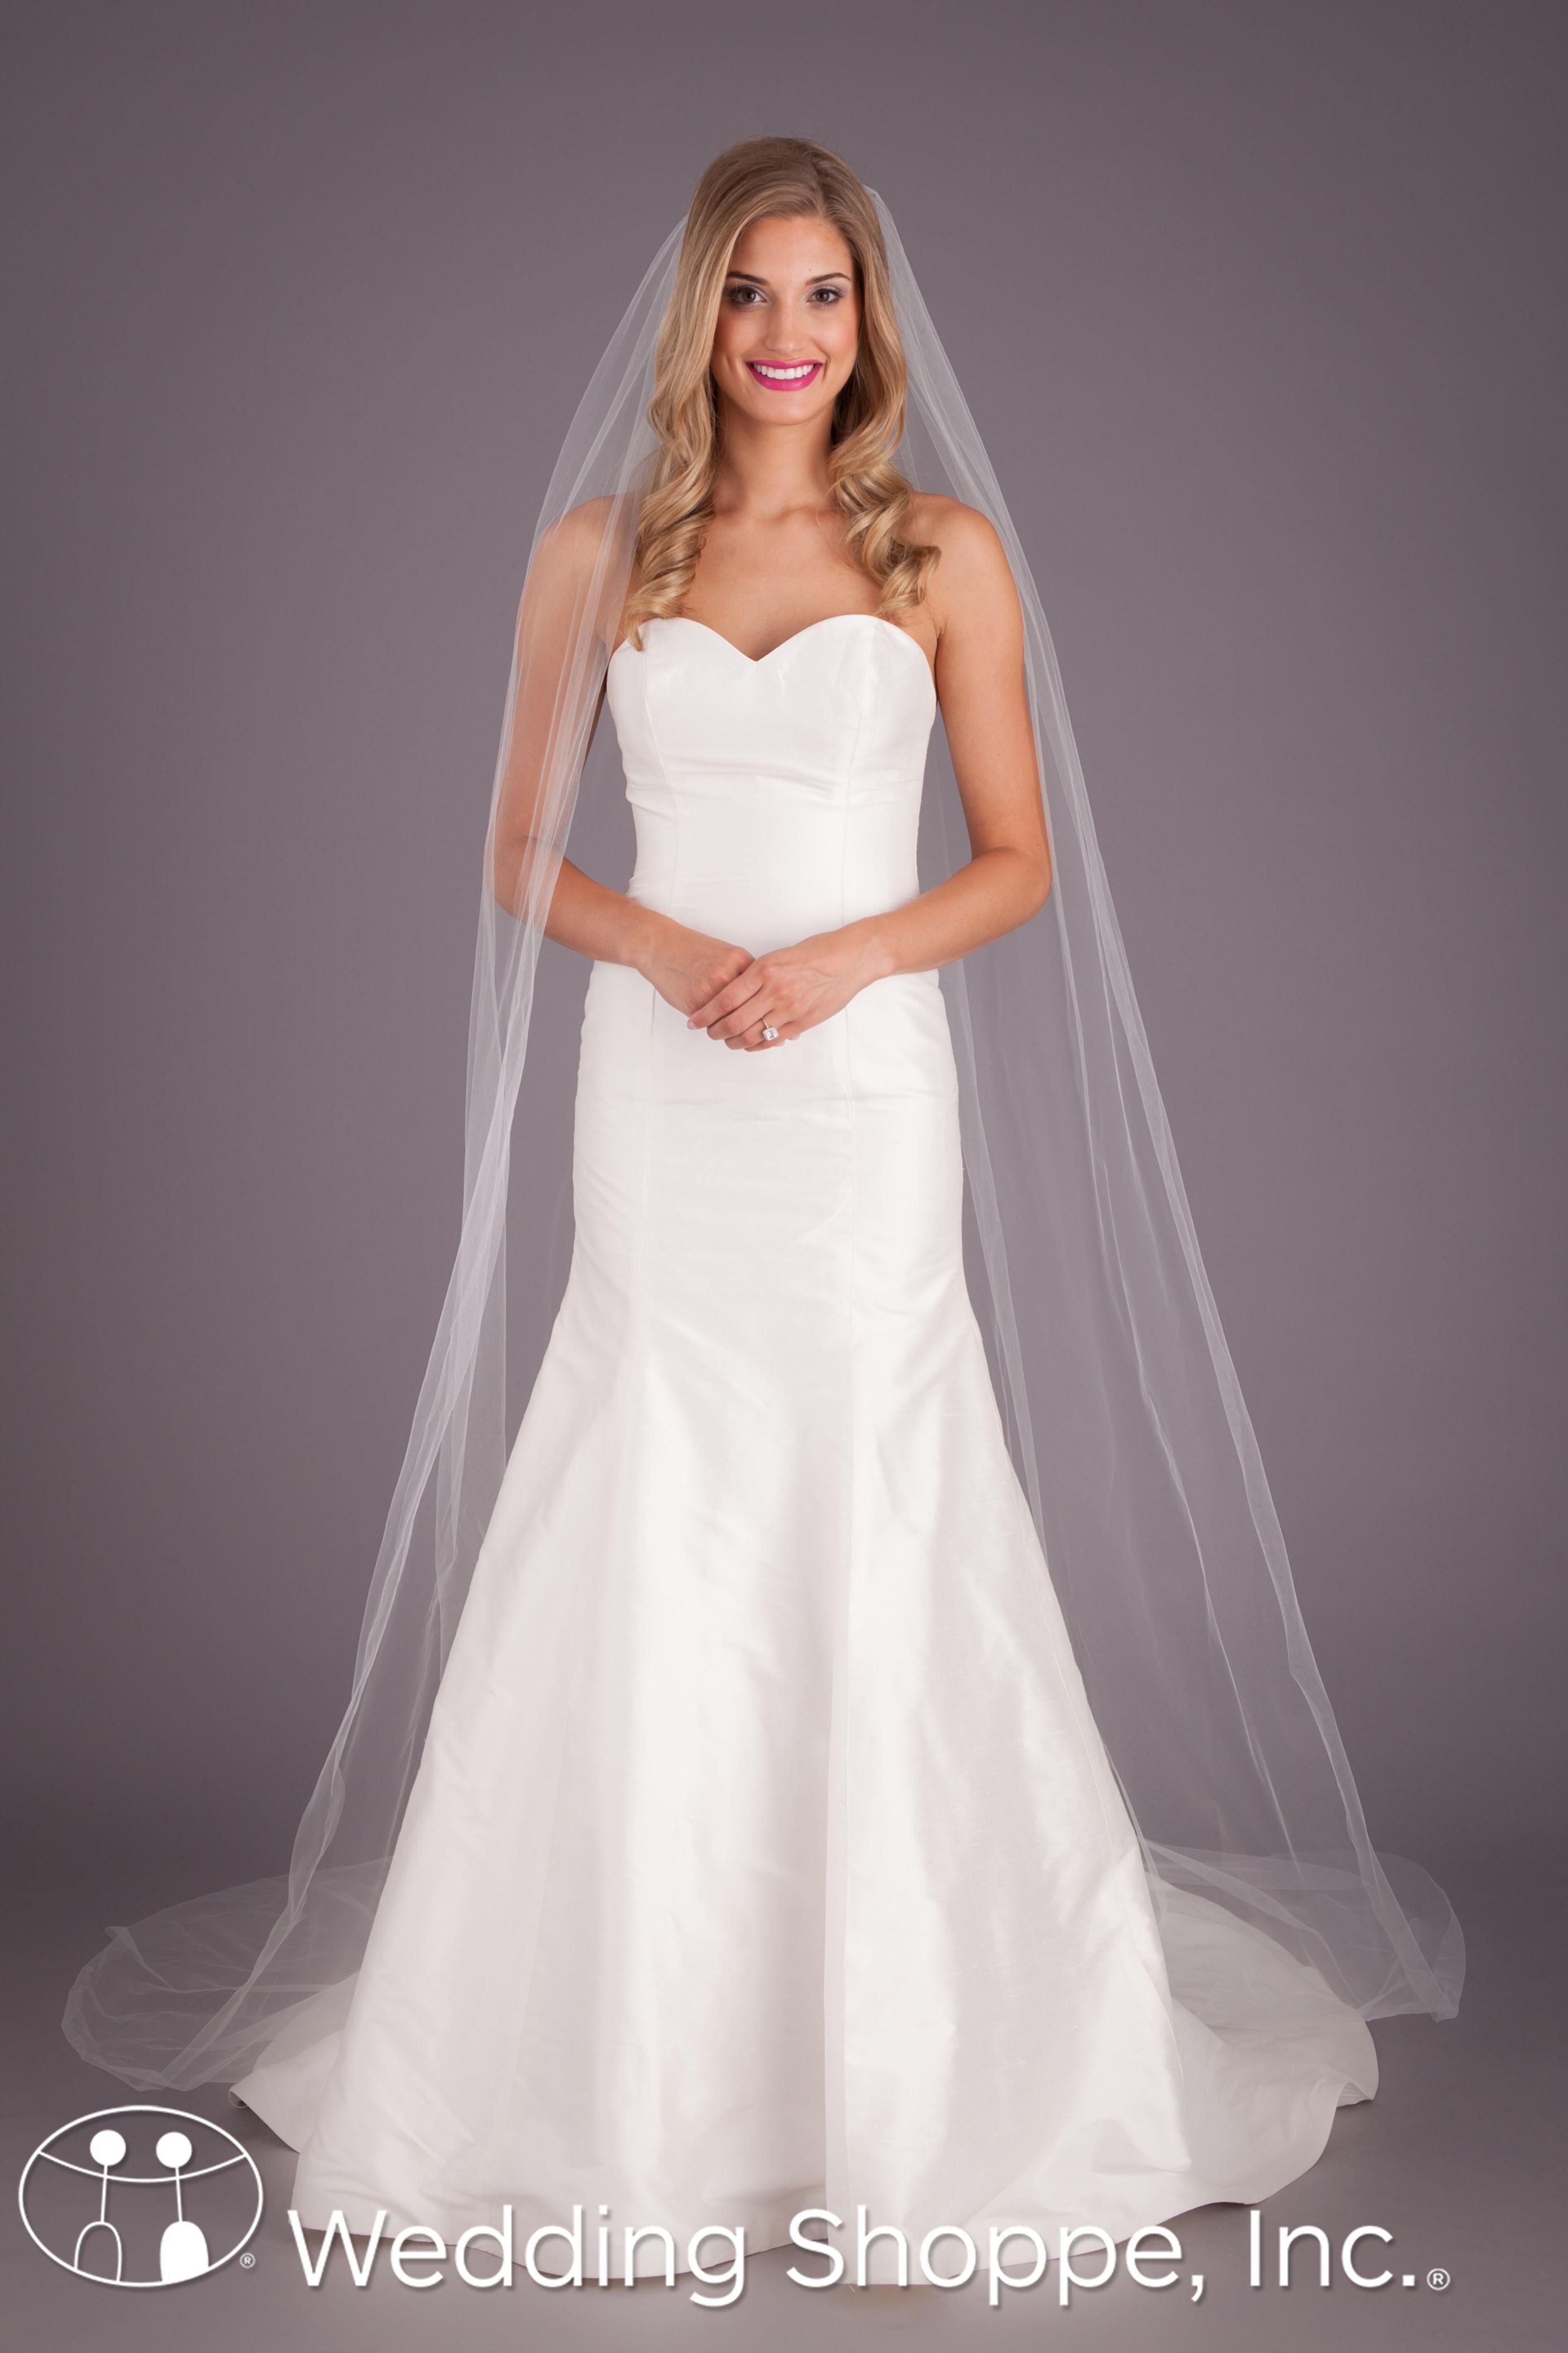 Kennedy Blue Lily Plain Wedding Dress Wedding Dresses Strapless Wedding Dress Hair [ 4211 x 2807 Pixel ]